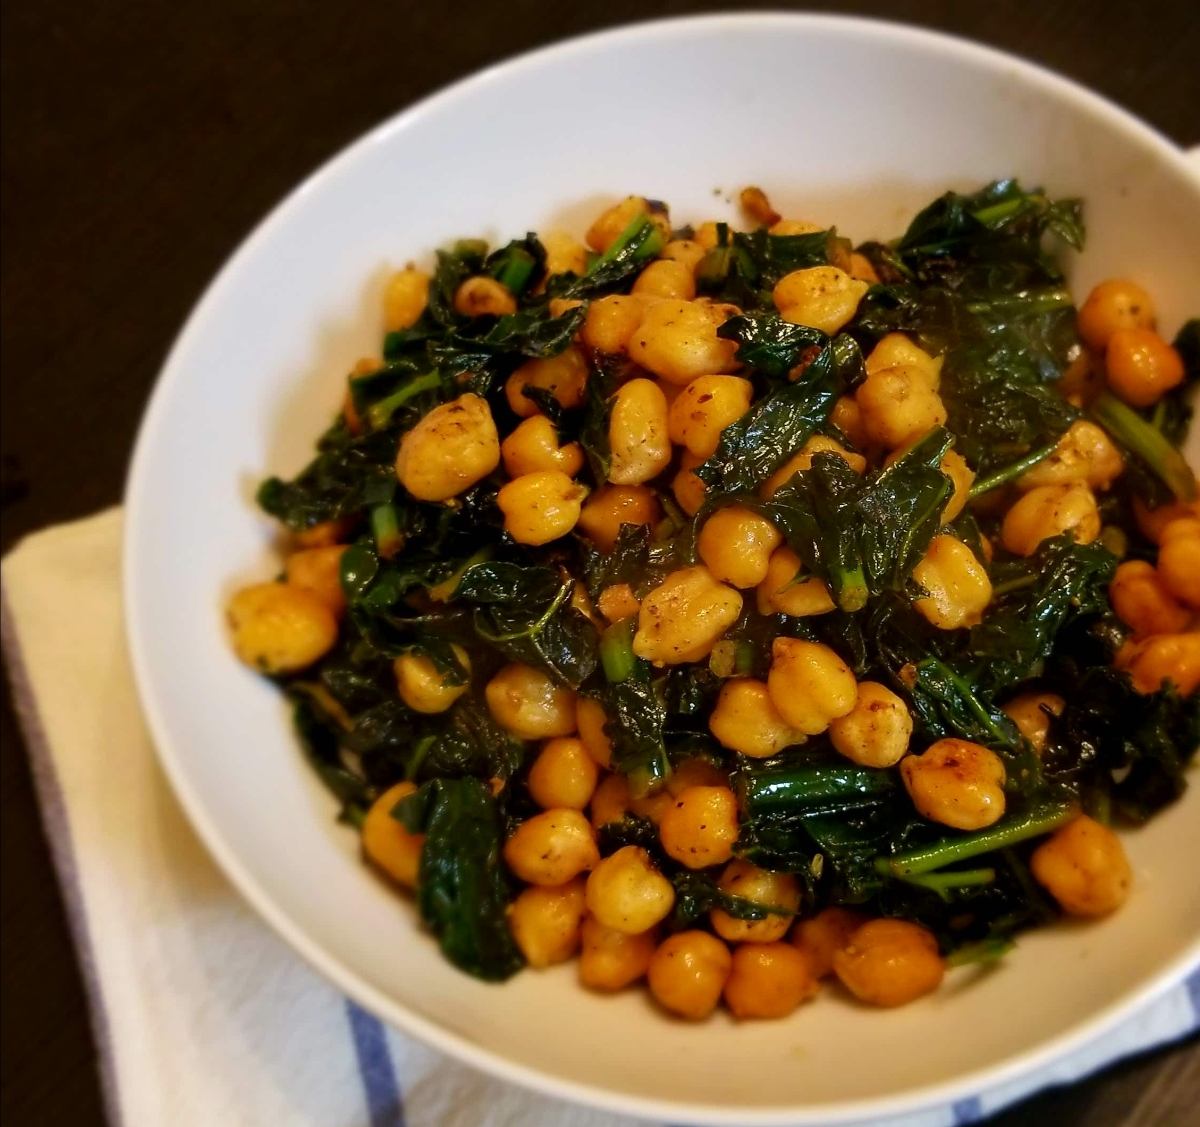 Kale Chickpea Stir-Fry